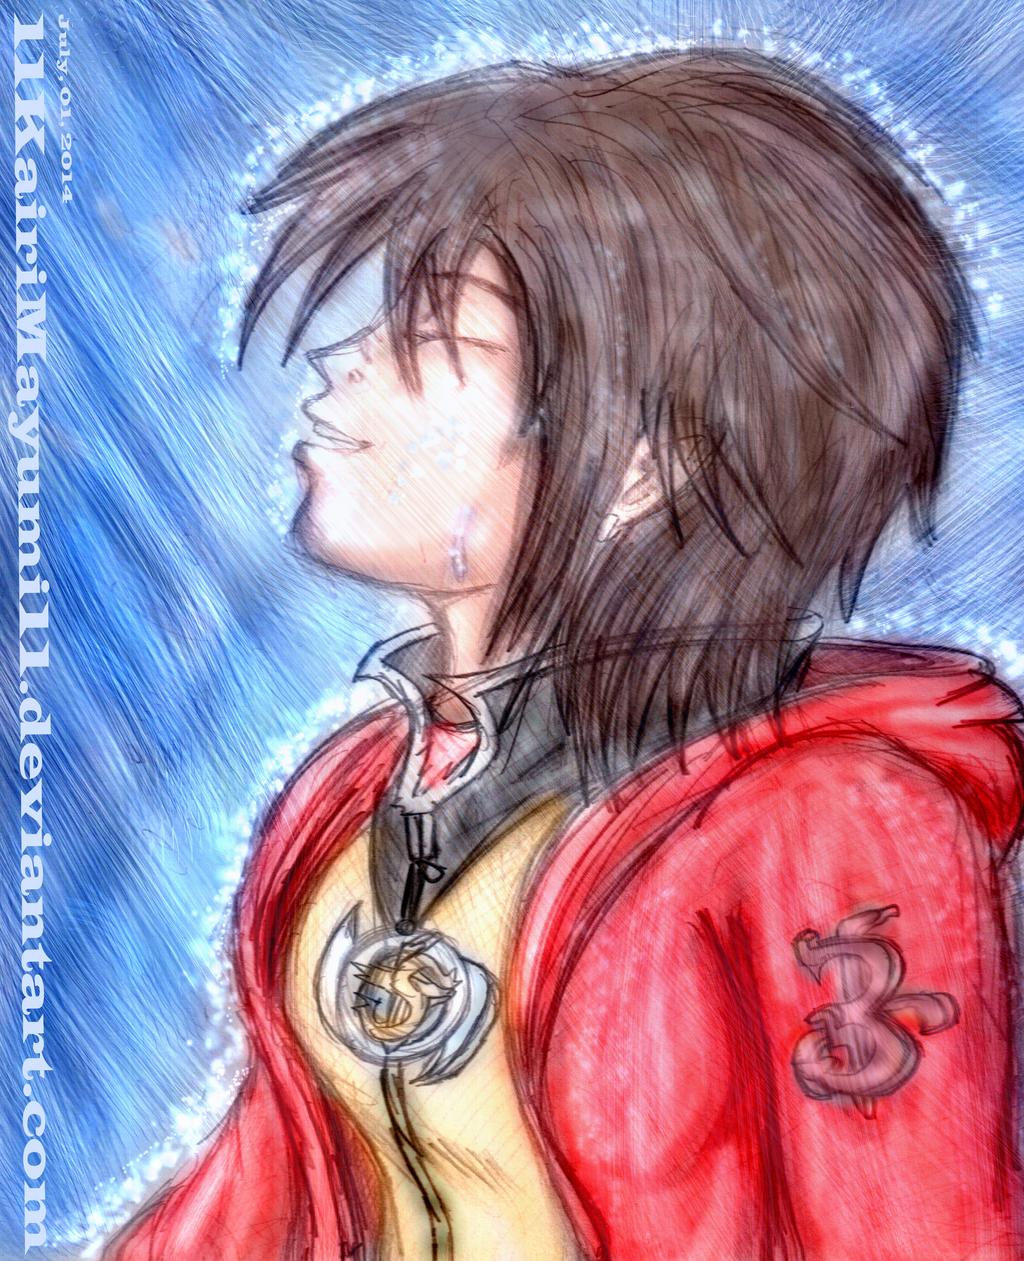 11KairiMayumi11's Profile Picture